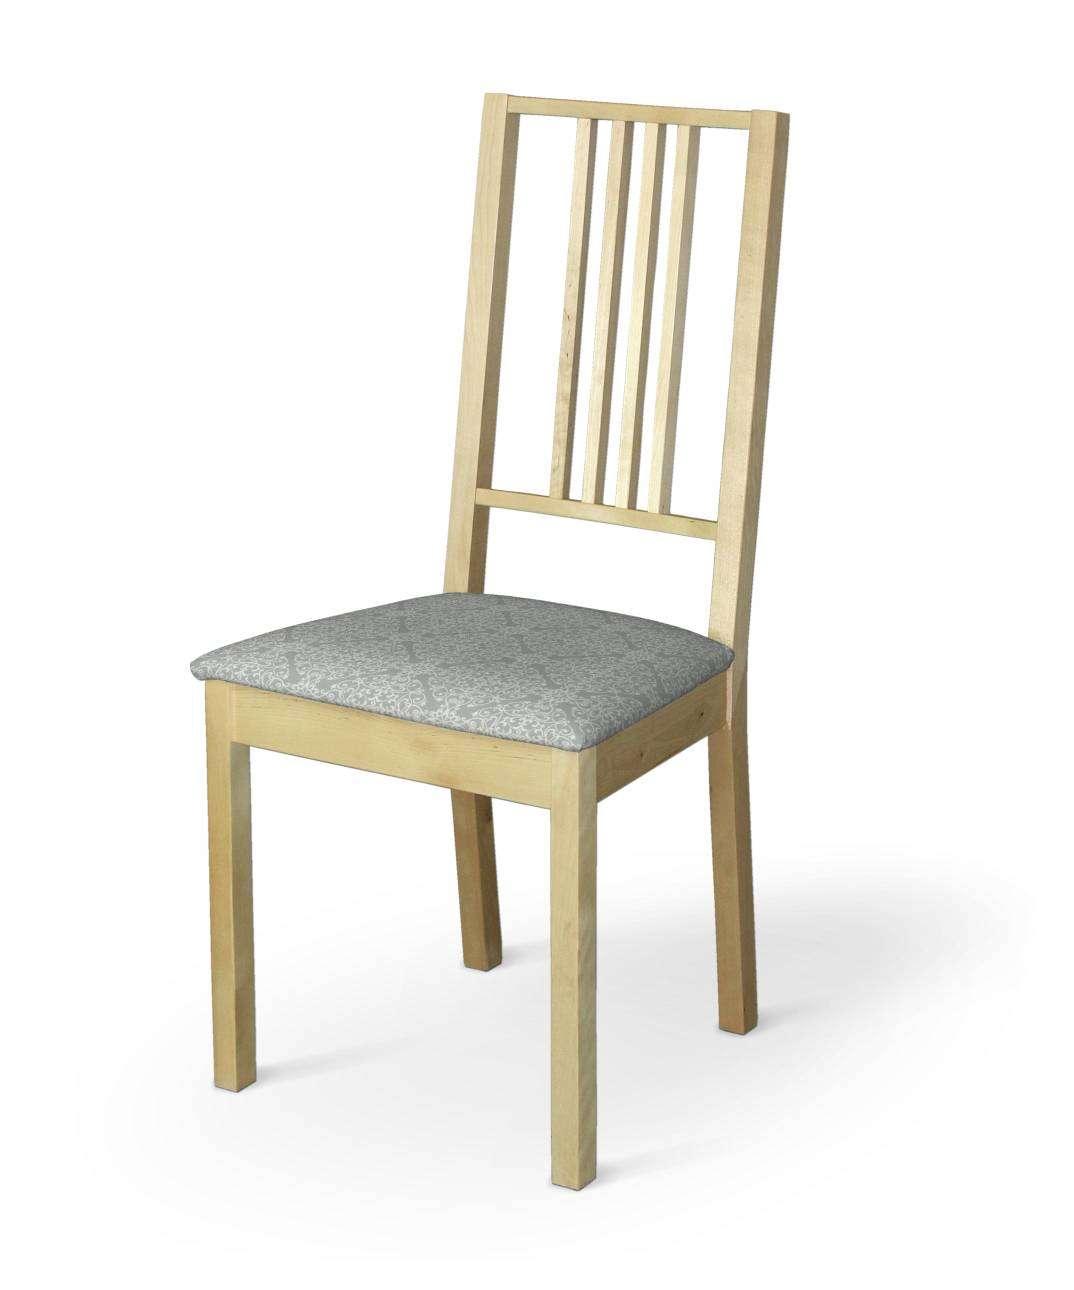 Börje Sitzbezug Stuhlbezug Börje von der Kollektion Flowers, Stoff: 140-38